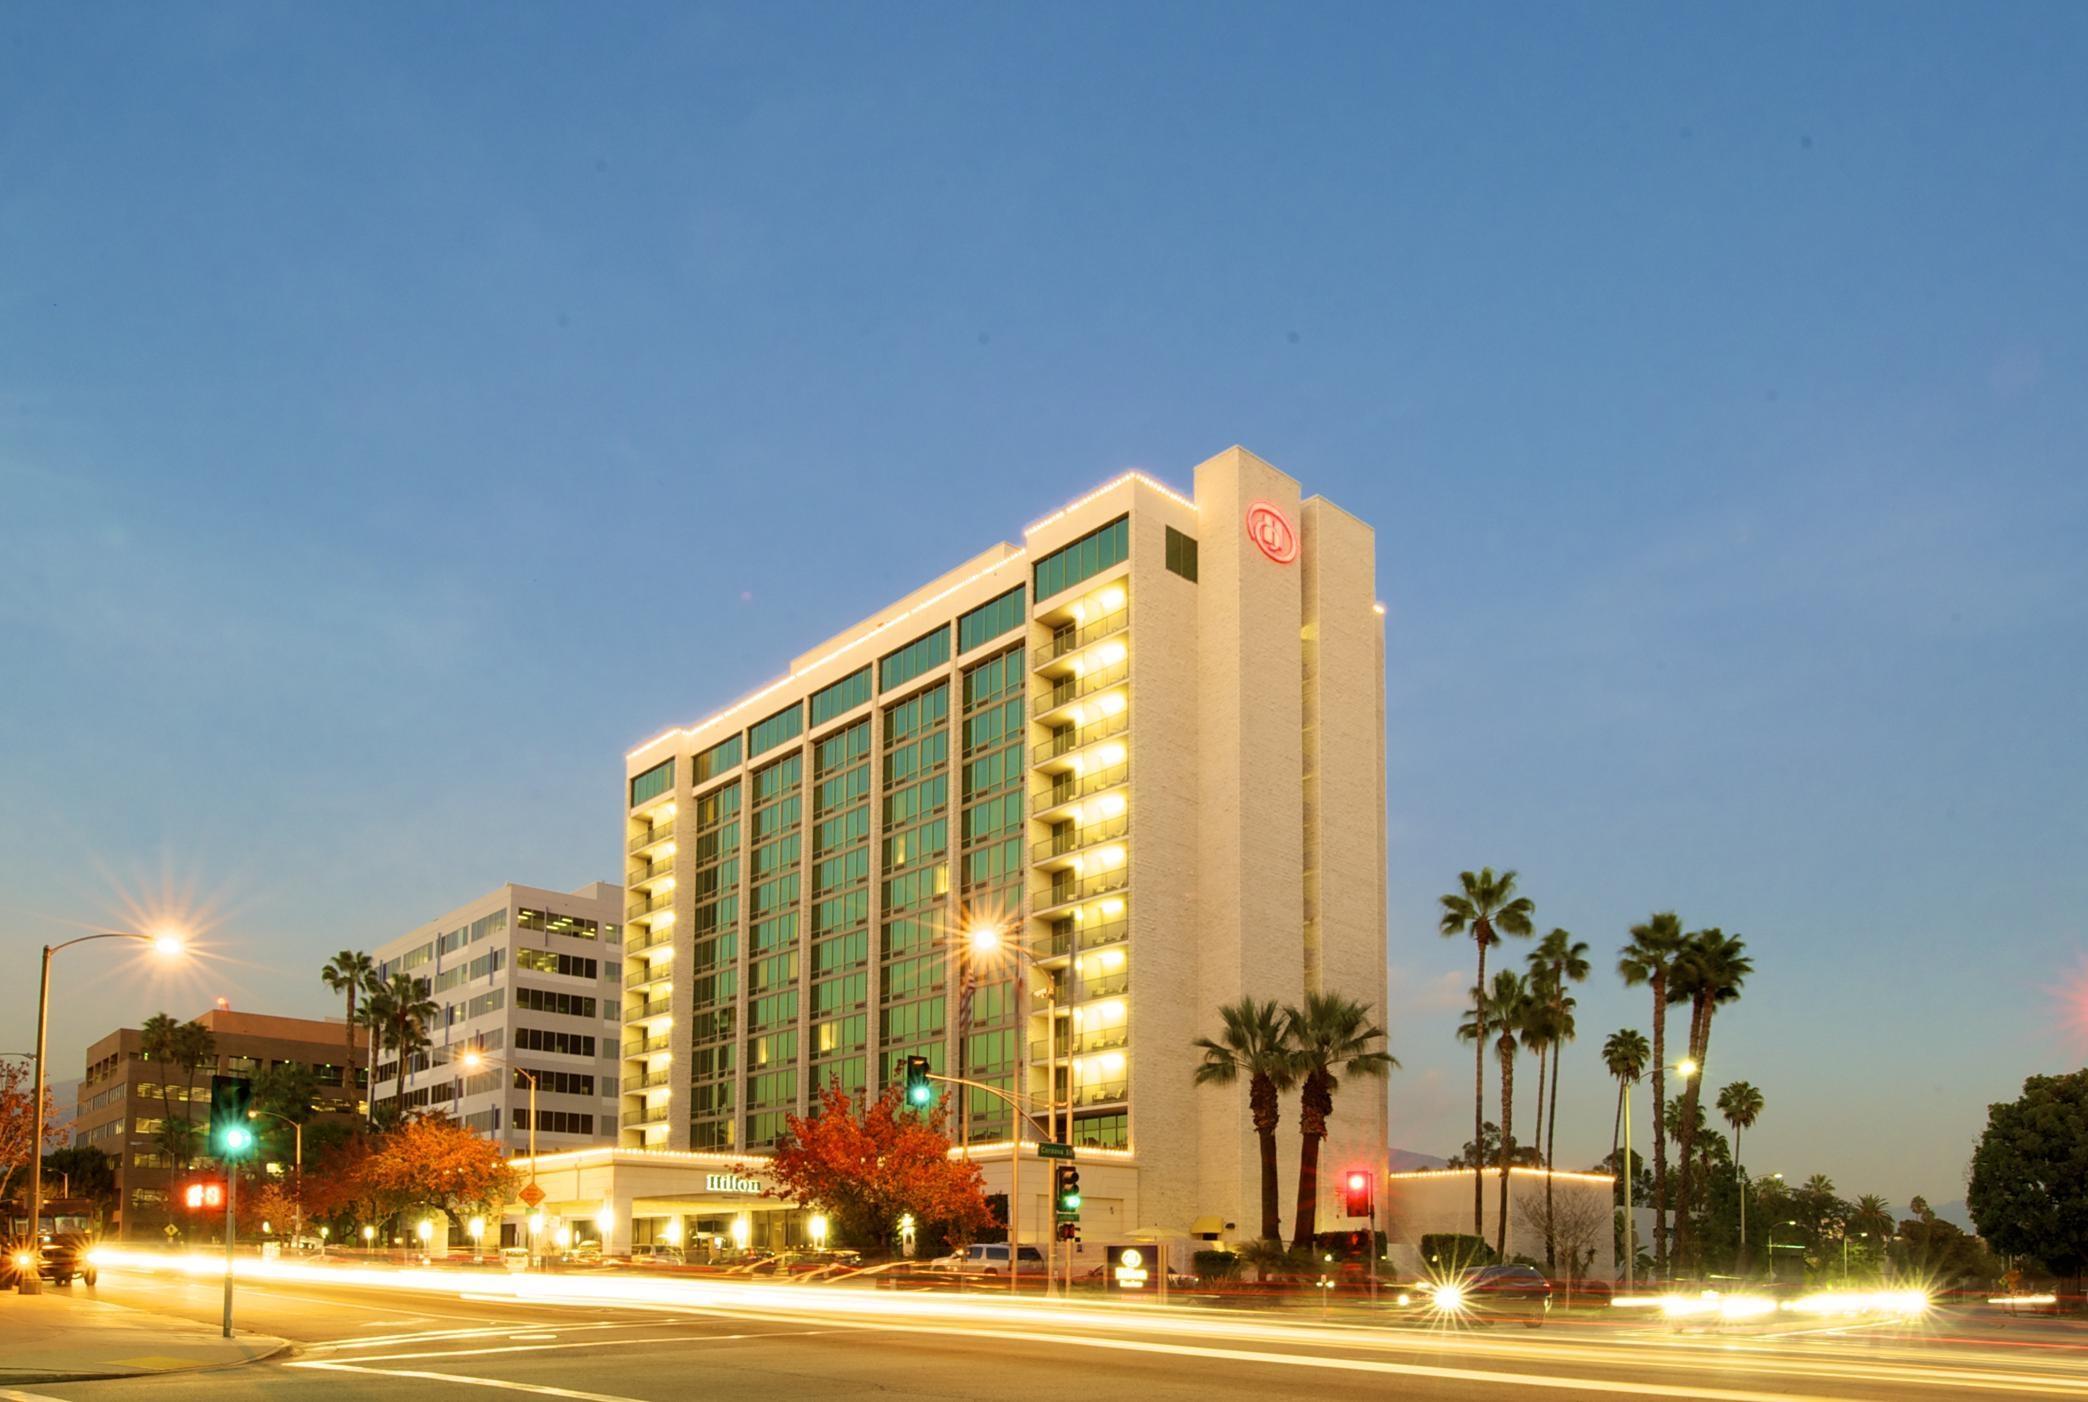 Pasadena Ca Hotels Near Rose Bowl Parade